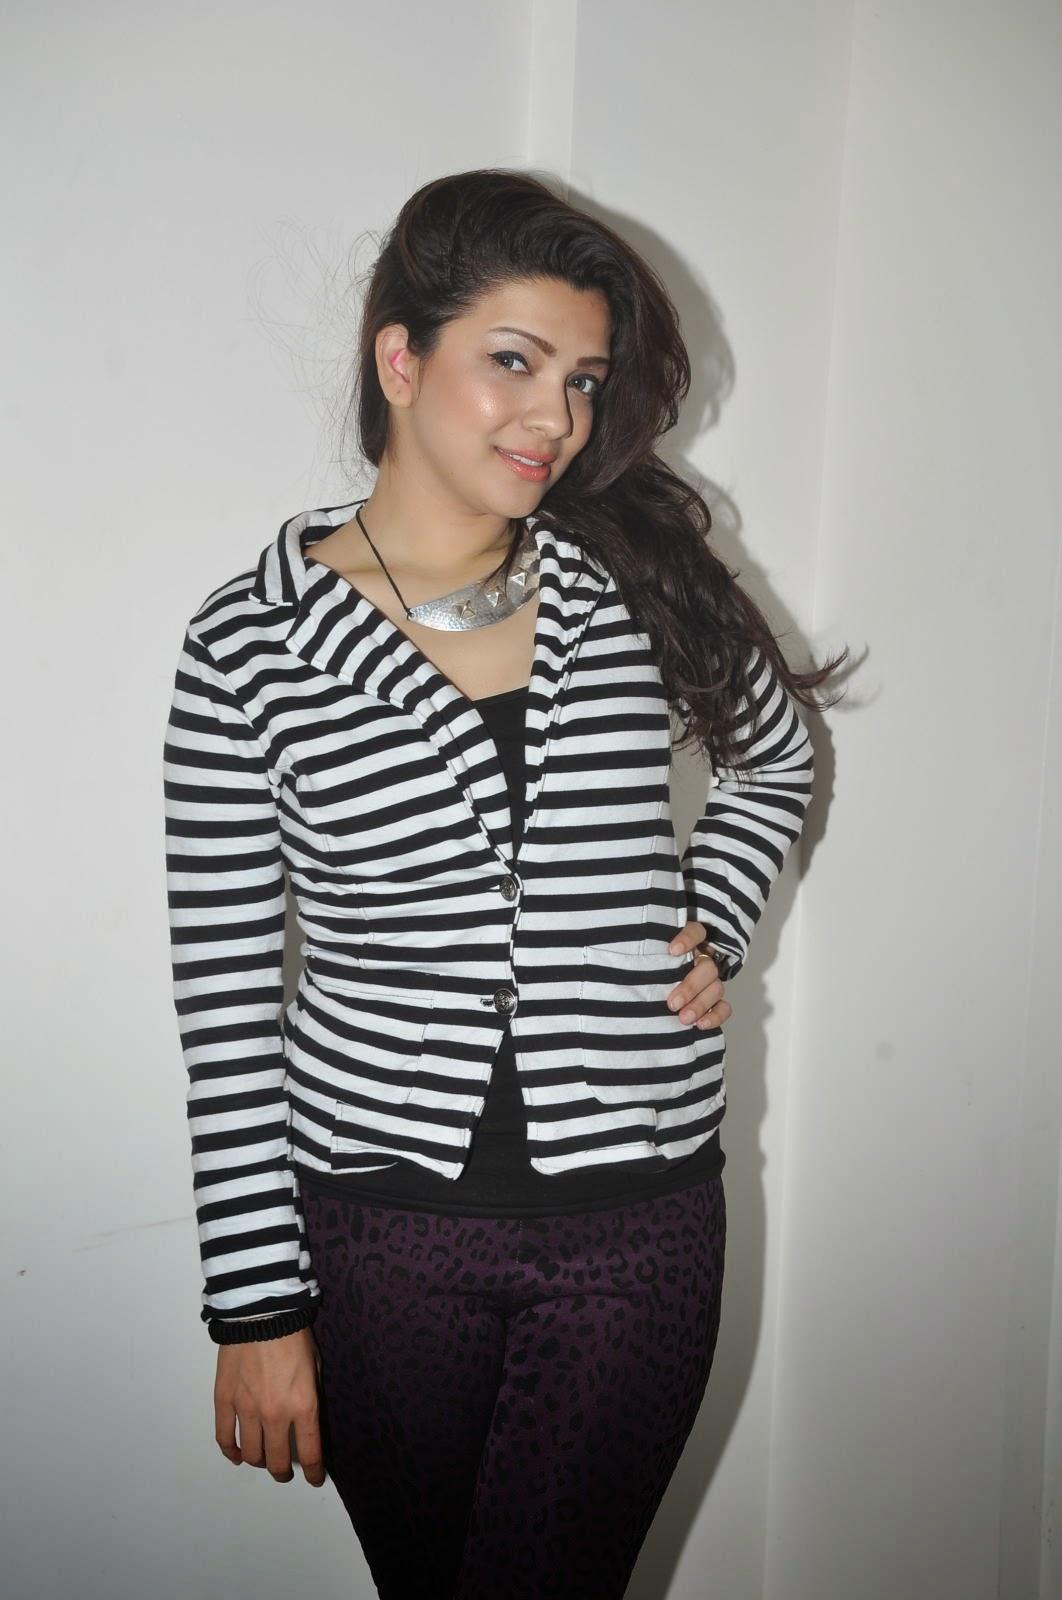 Actress Pari Nidhi Glam photos Gallery-HQ-Photo-11